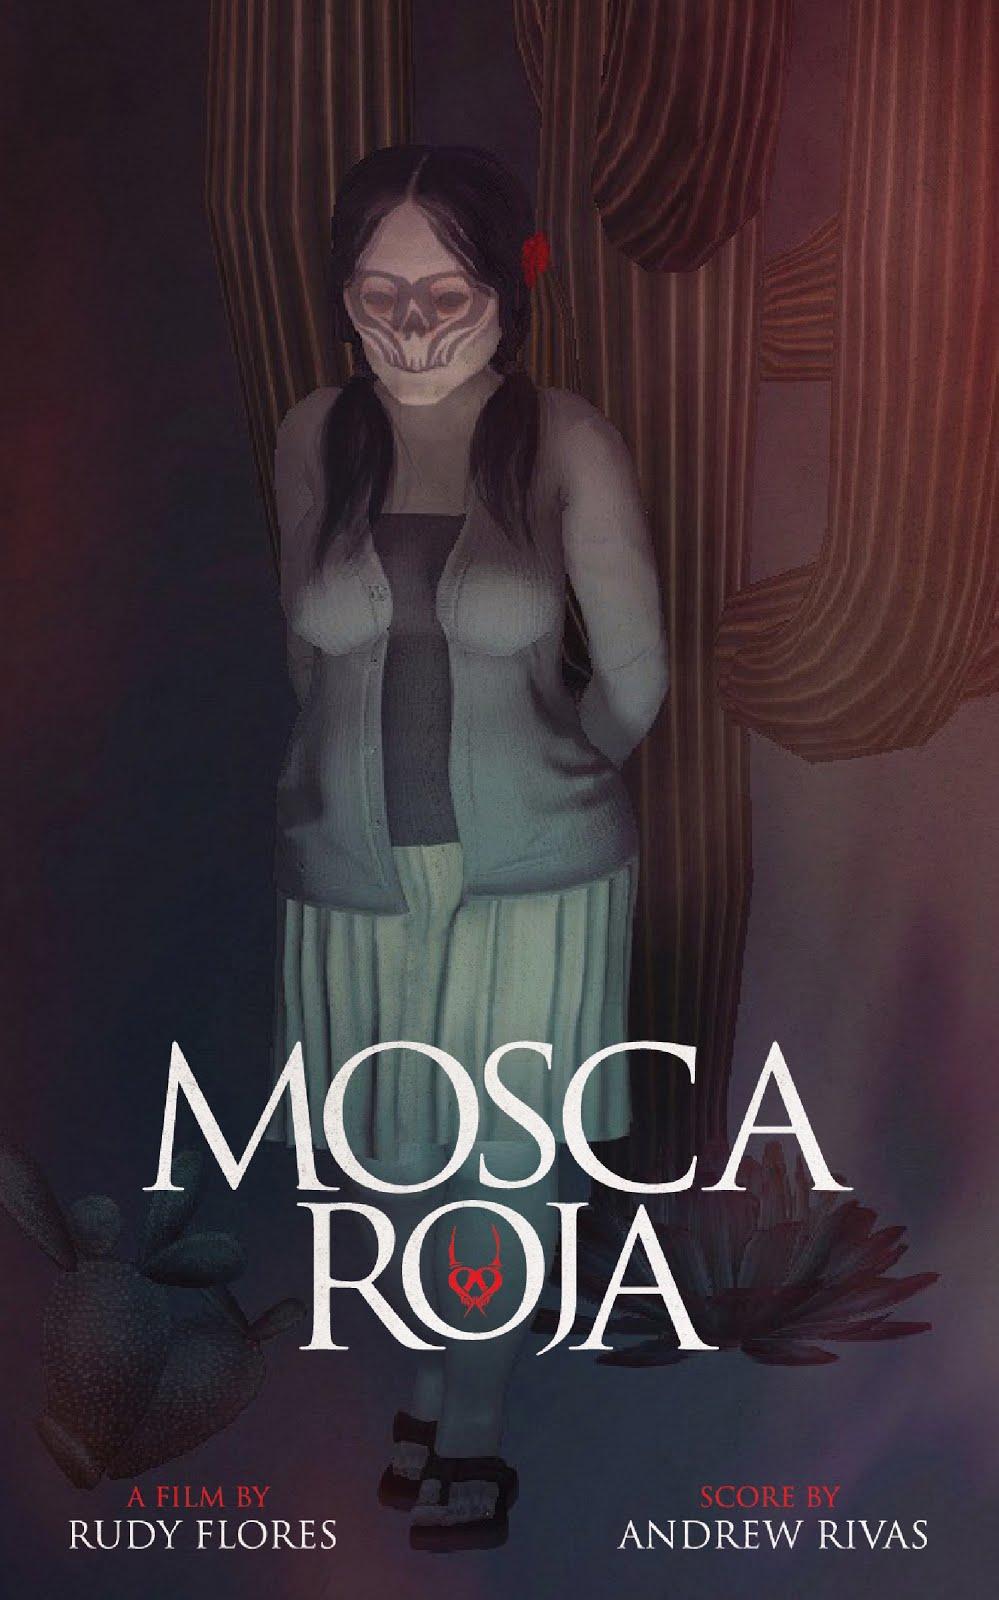 Mosca Roja Trailer